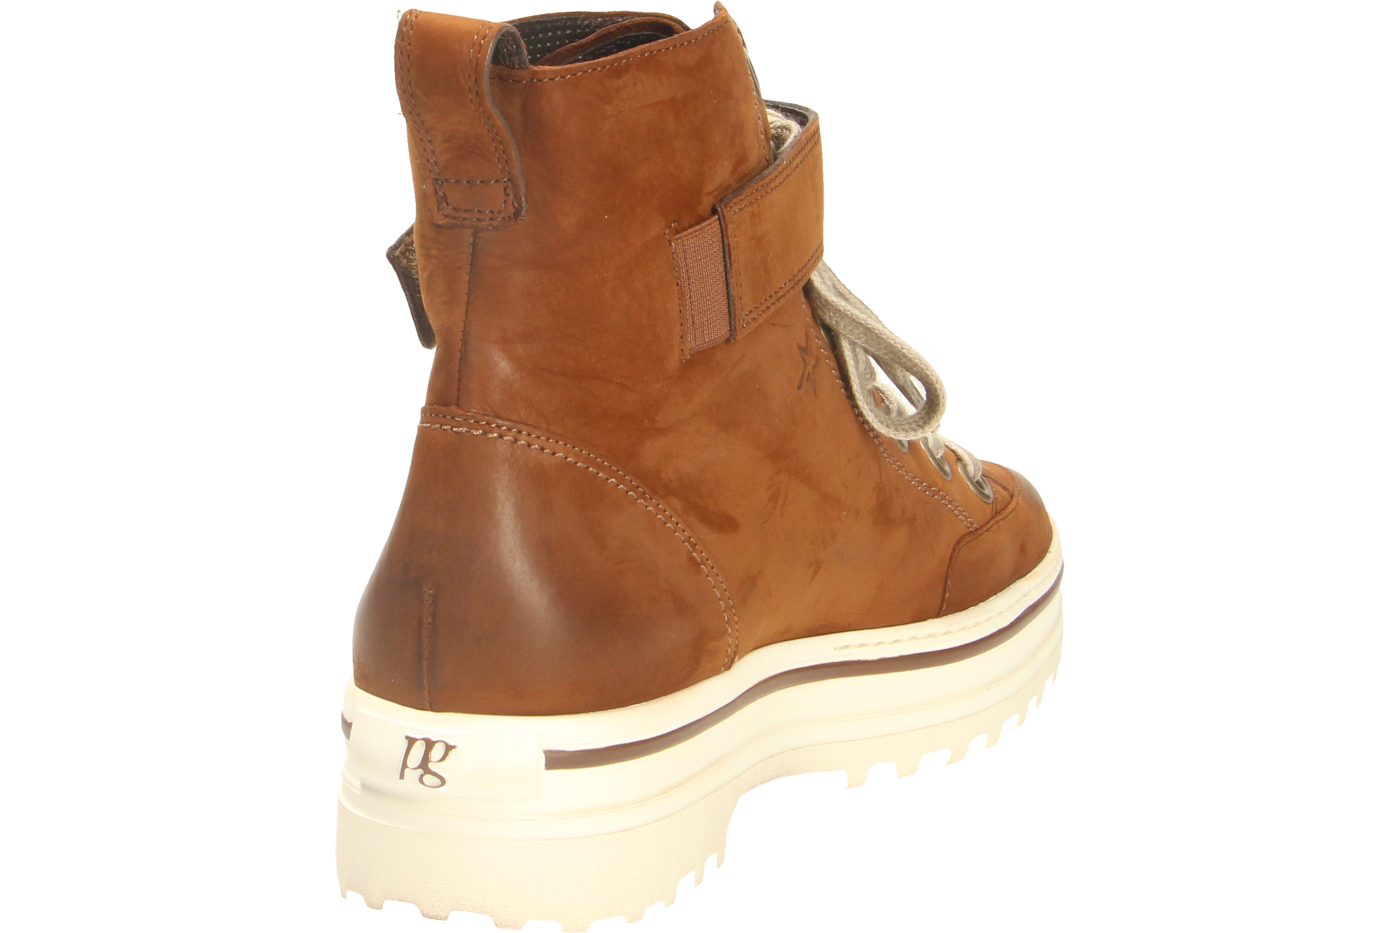 Paul Green 4852 Stiefel Stiefel 4852 015 5